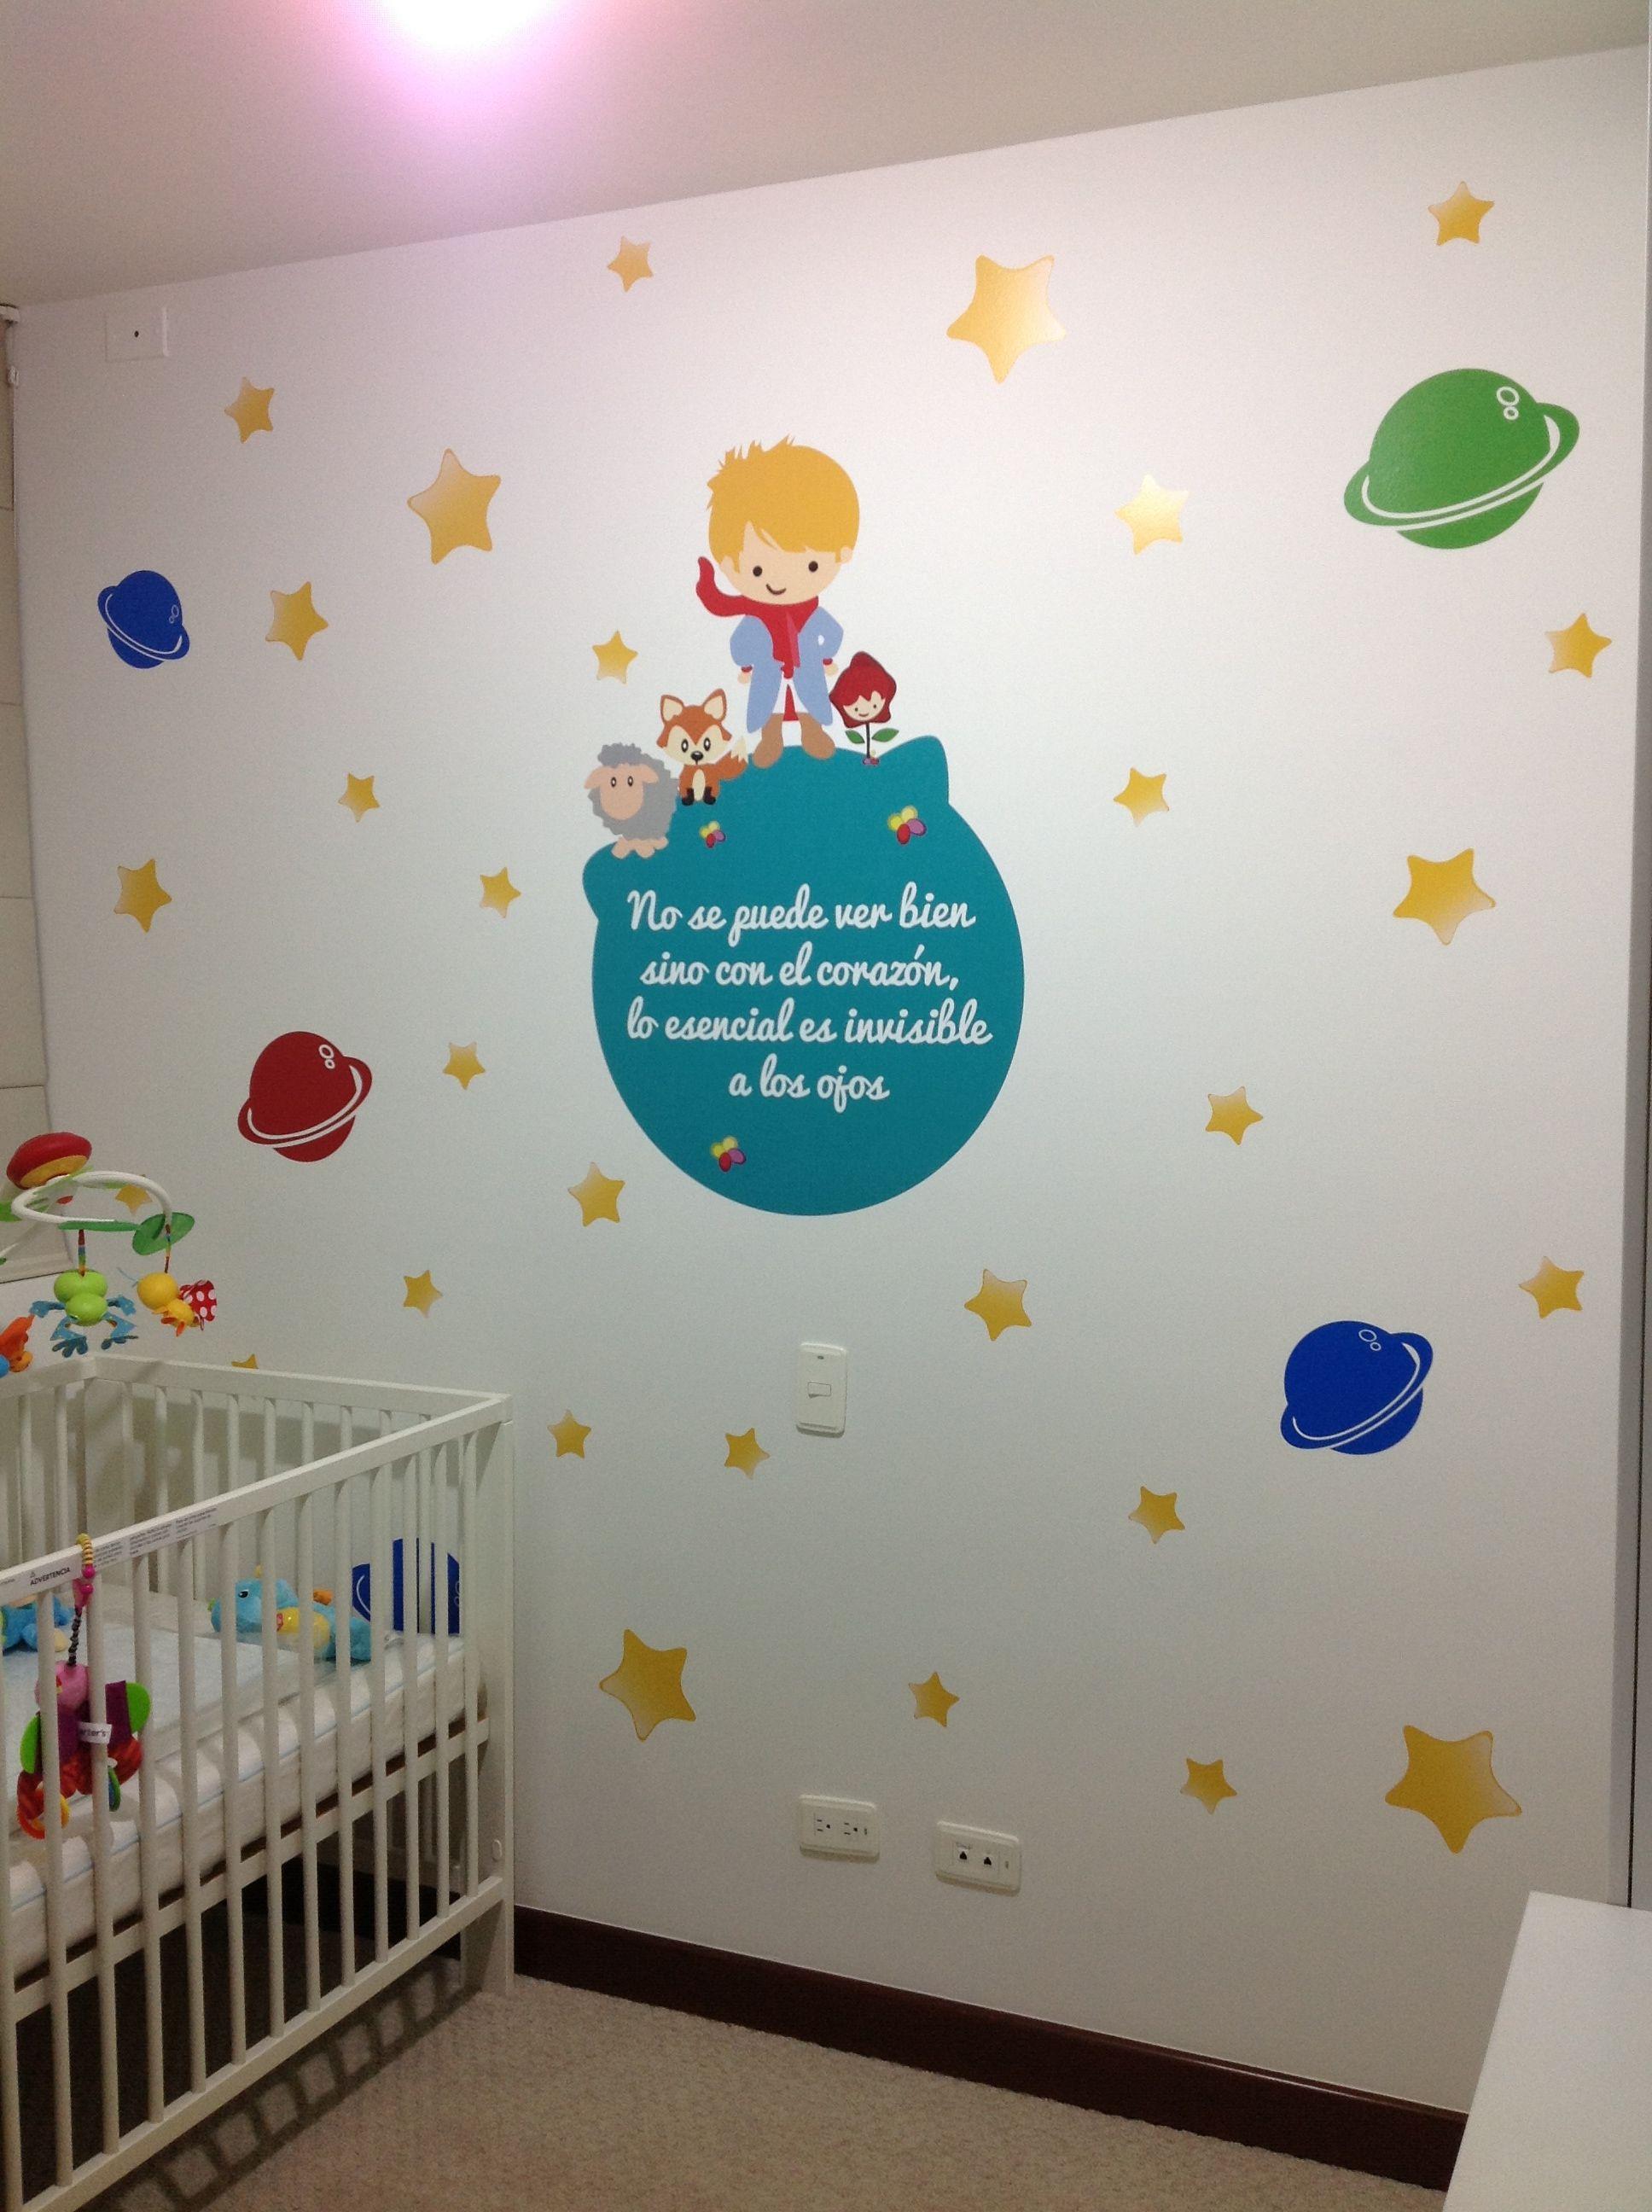 Decoraci n infantil principito vinilosdecorativos clientesfelices espaciosfelices juanpa - Decoracion infantil paredes ...